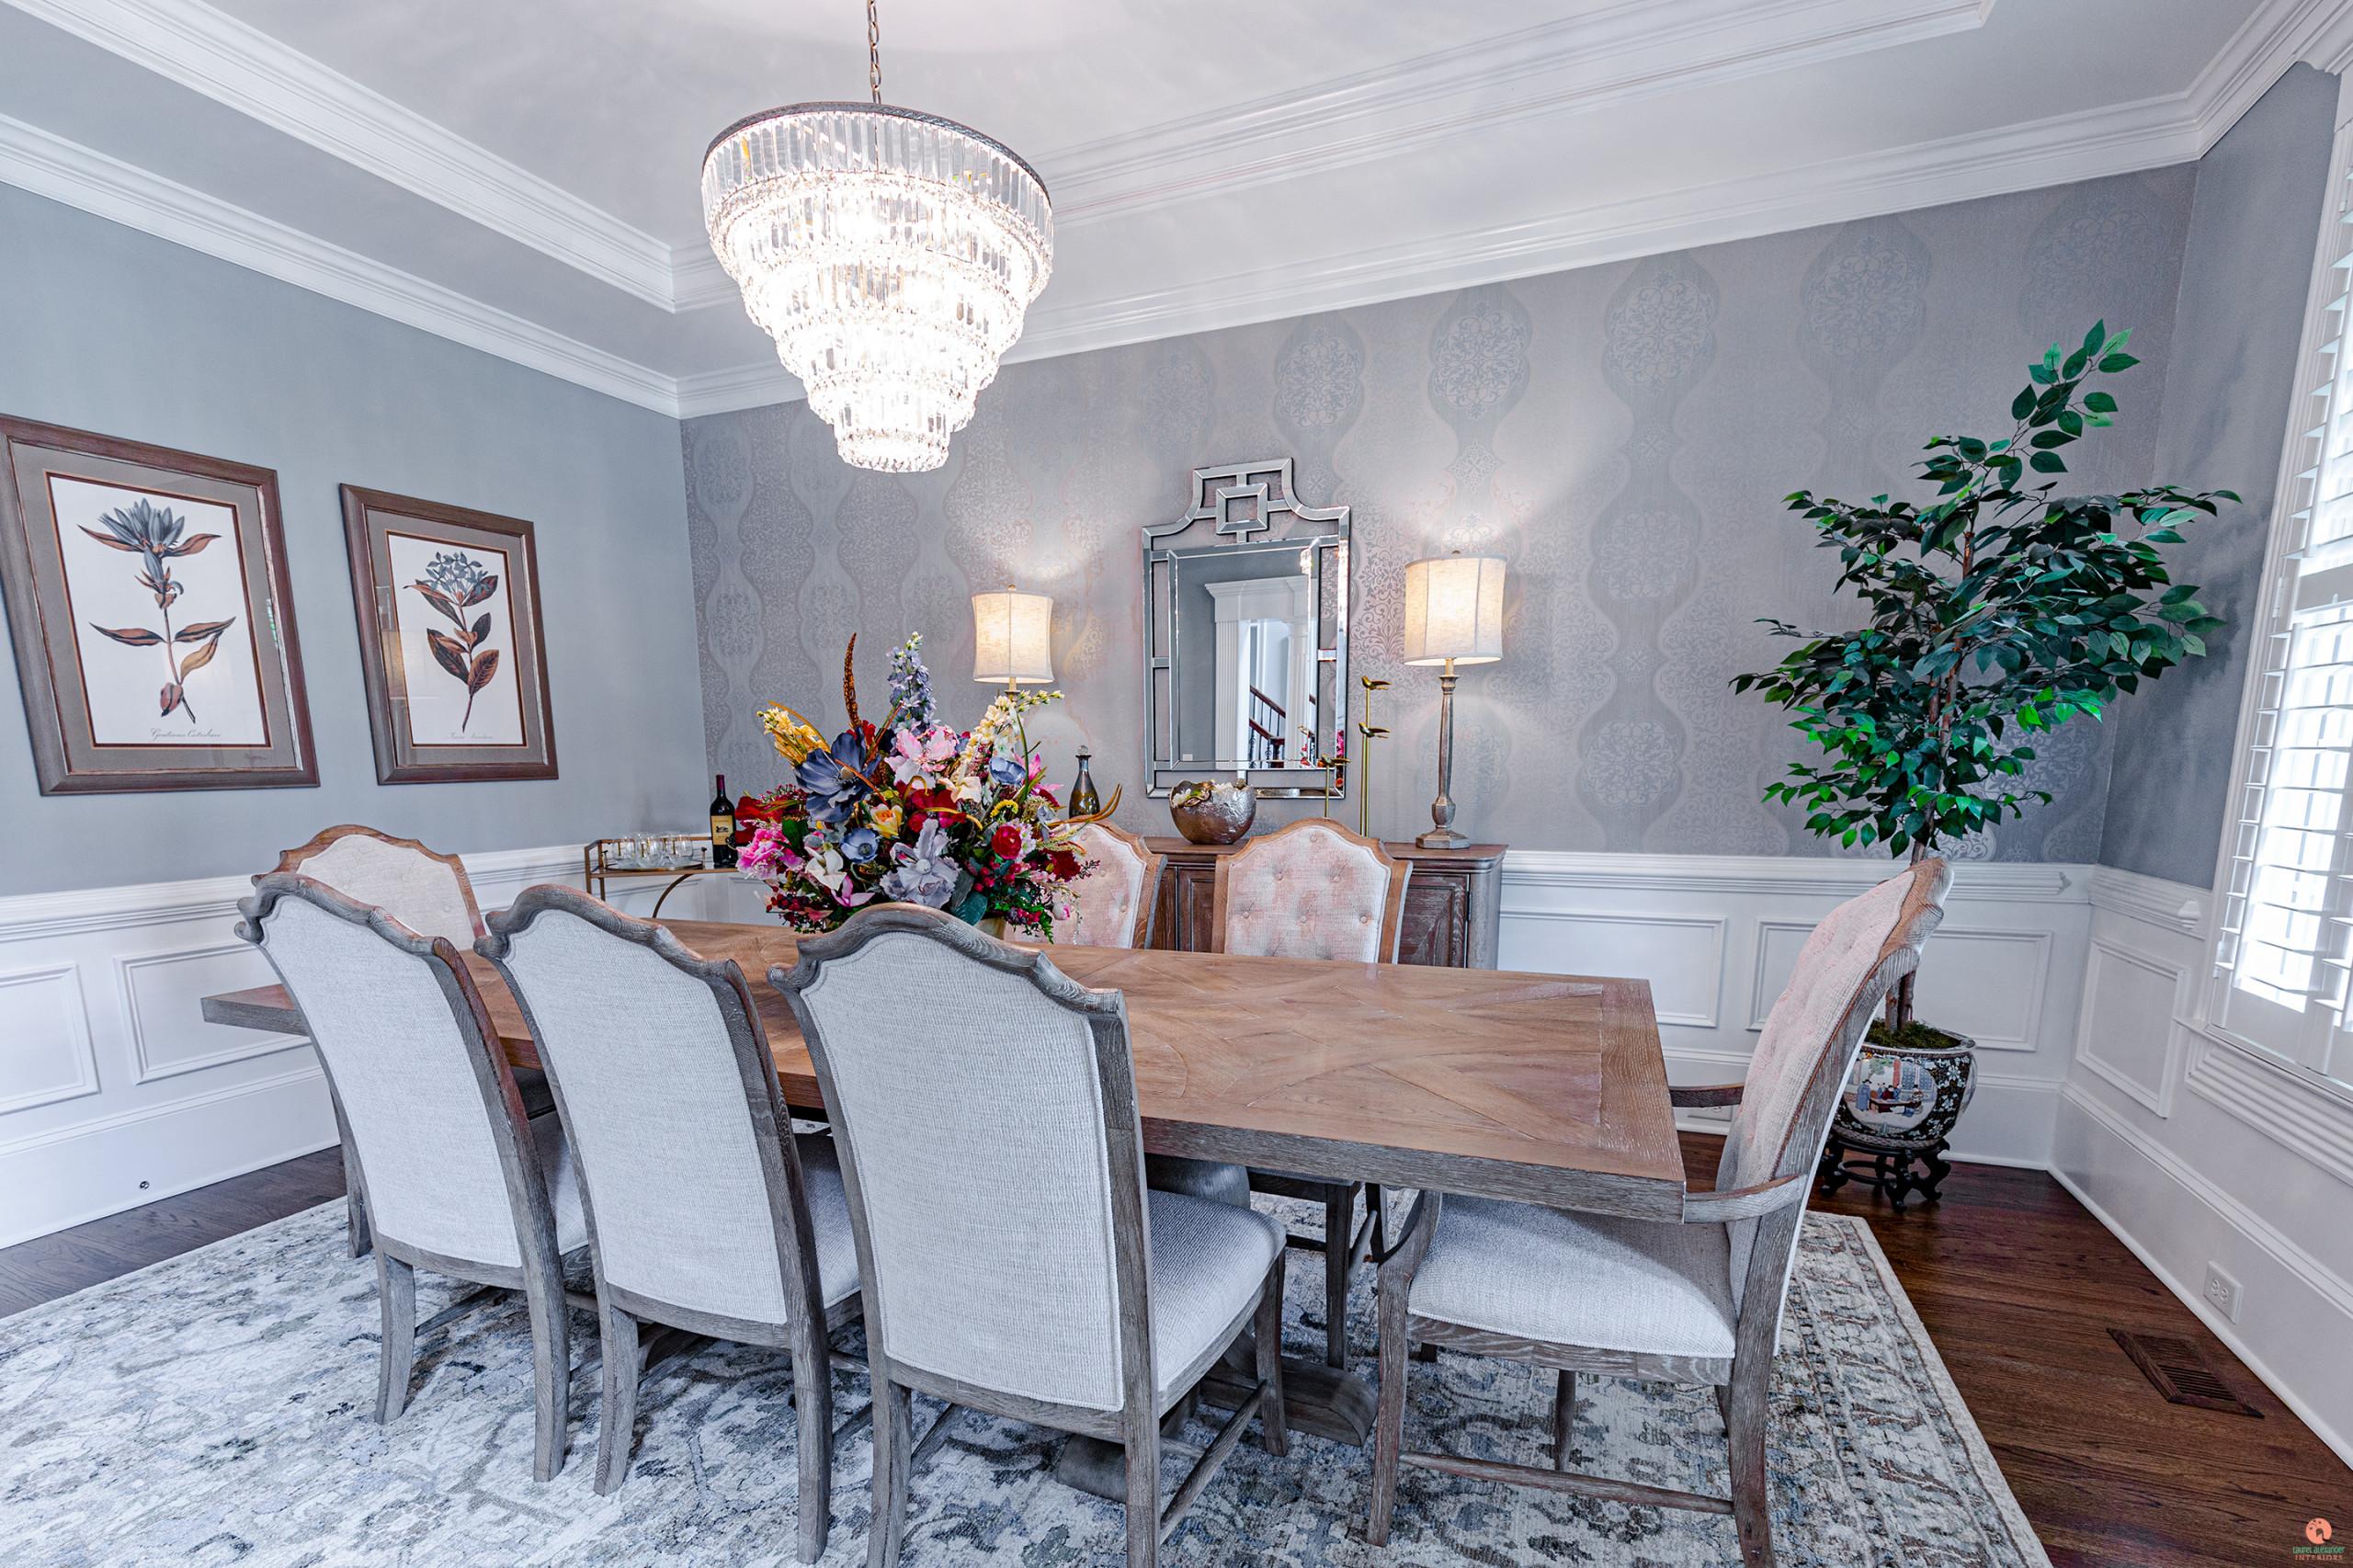 Whole Home Design and Decor